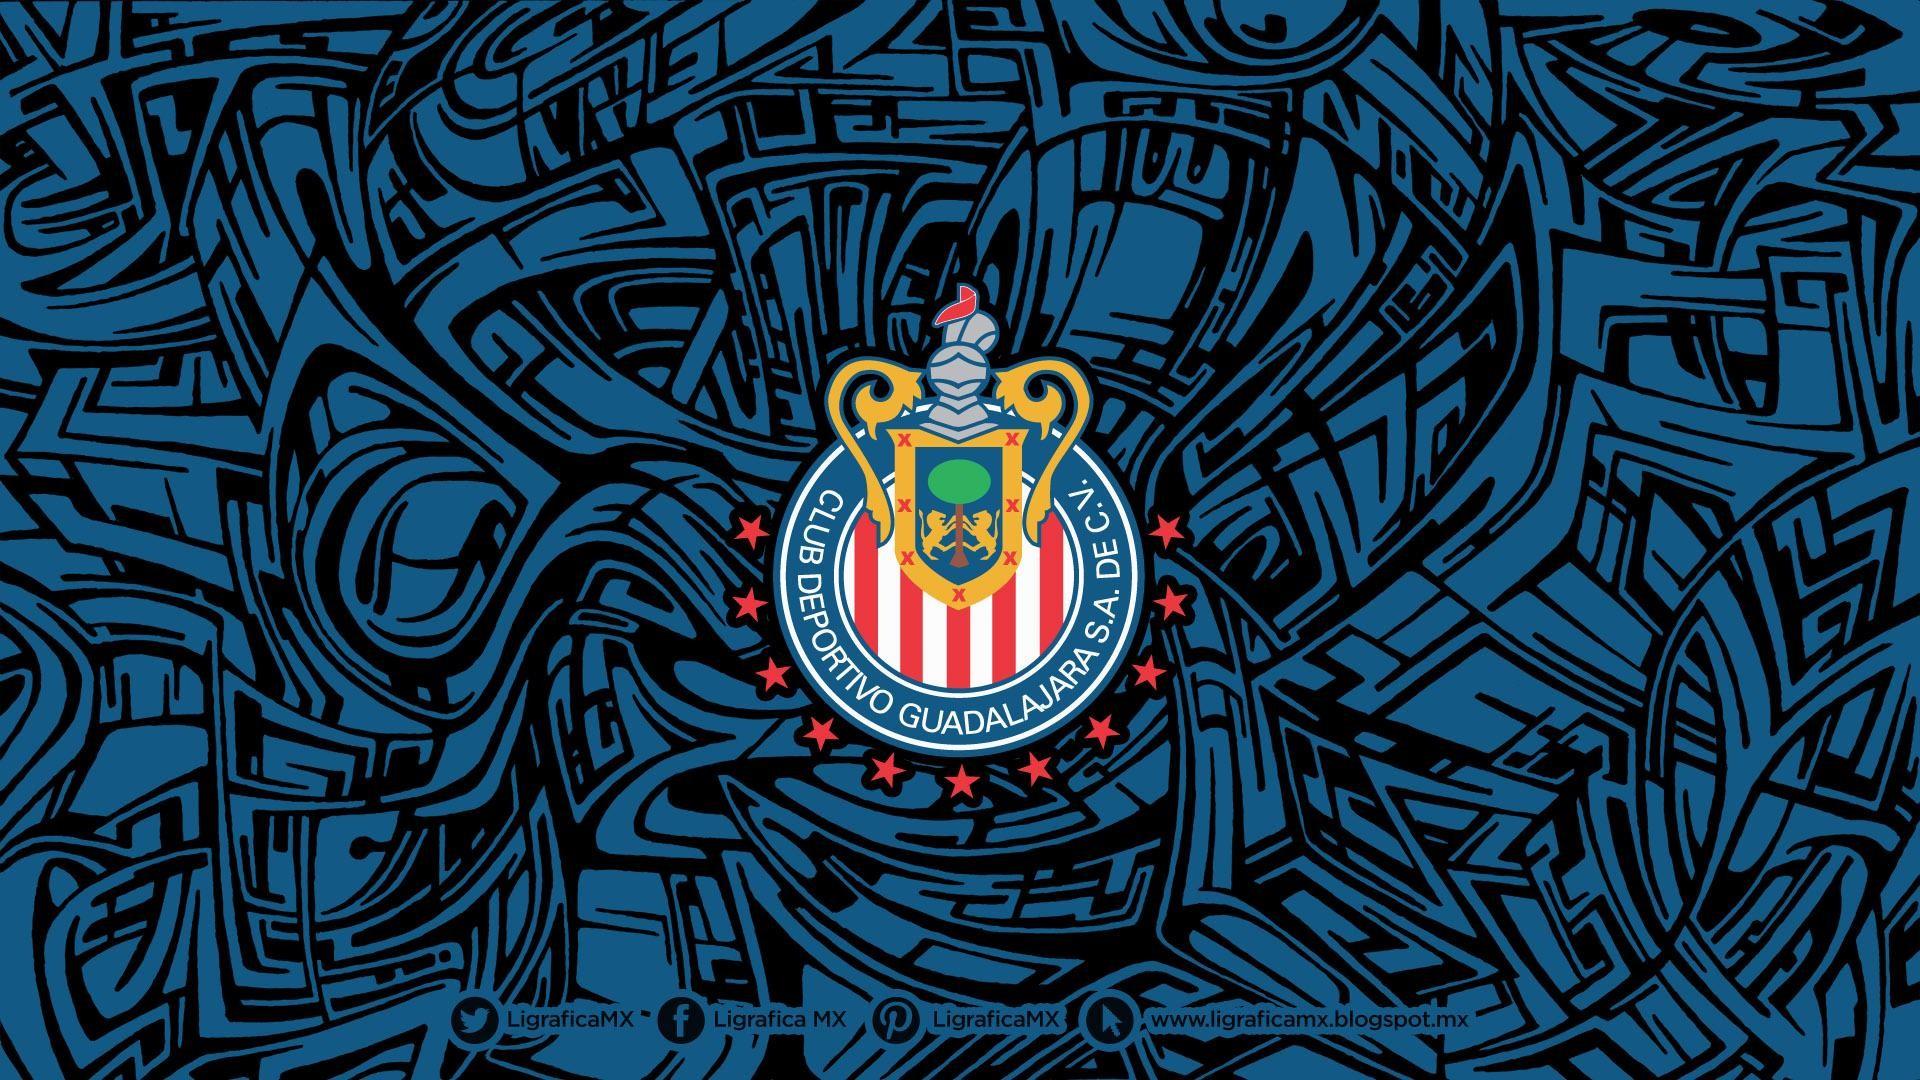 Chivas-%E2%80%A2-LigraficaMX-180314CTG1-wallpaper